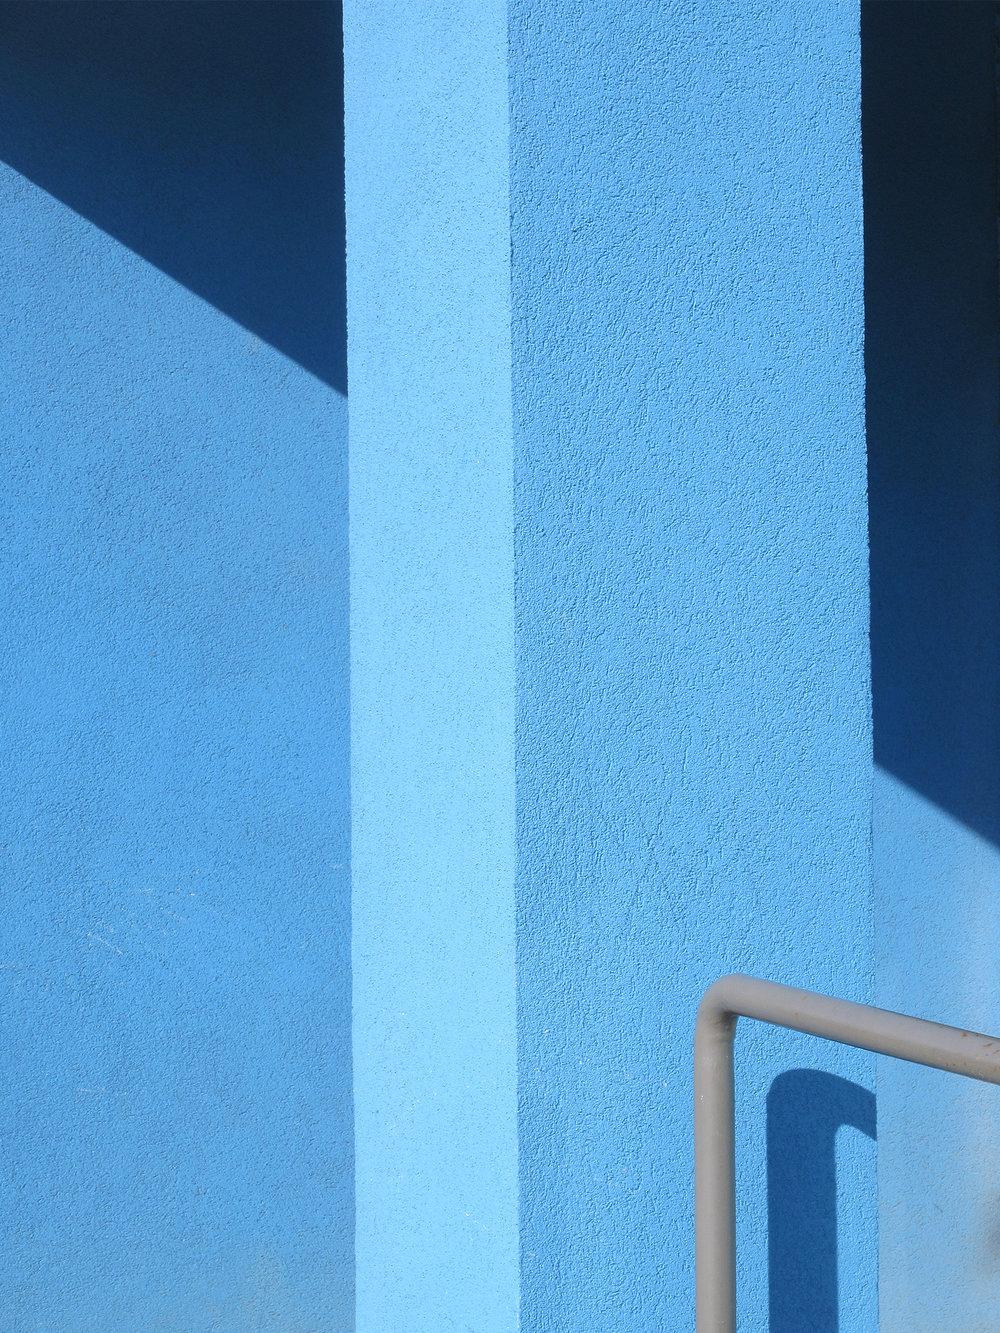 06- Blue.jpg